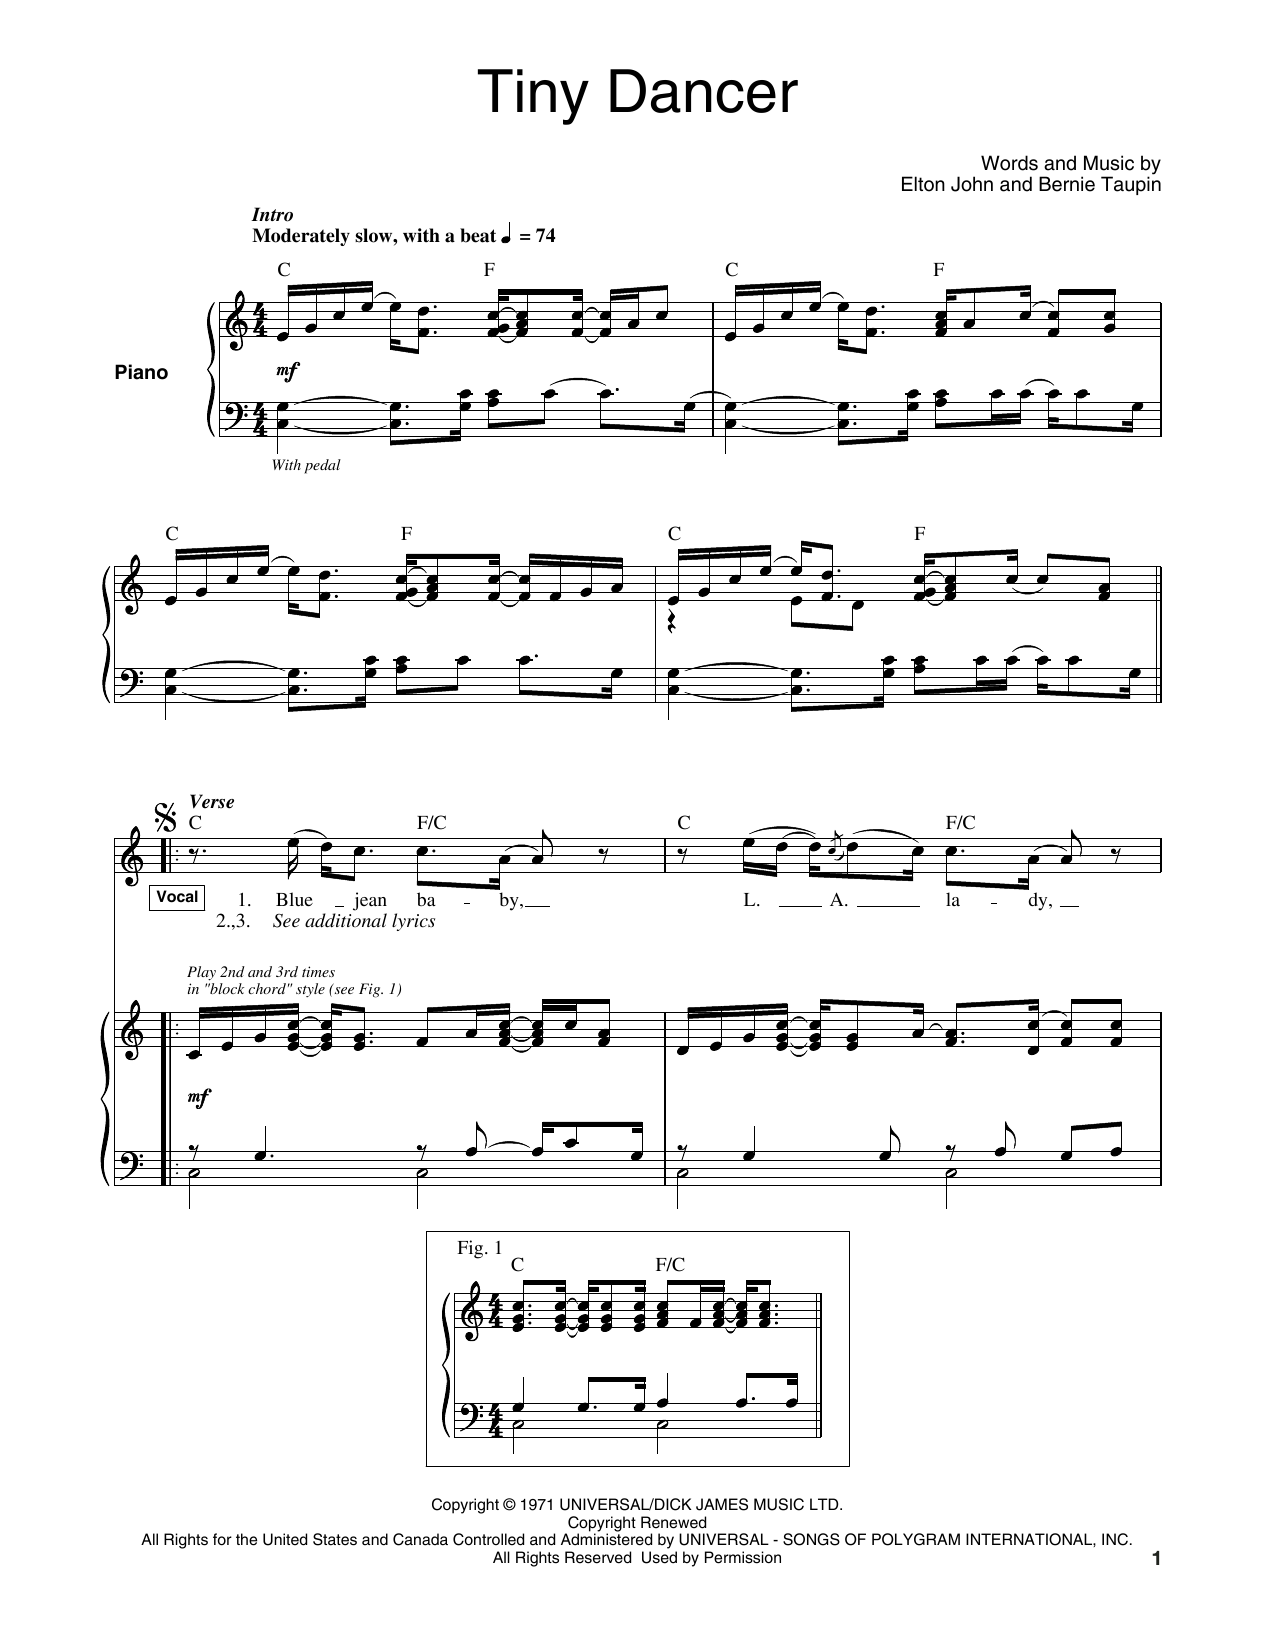 Elton john tiny dancer sheet music at stantons sheet music hexwebz Gallery